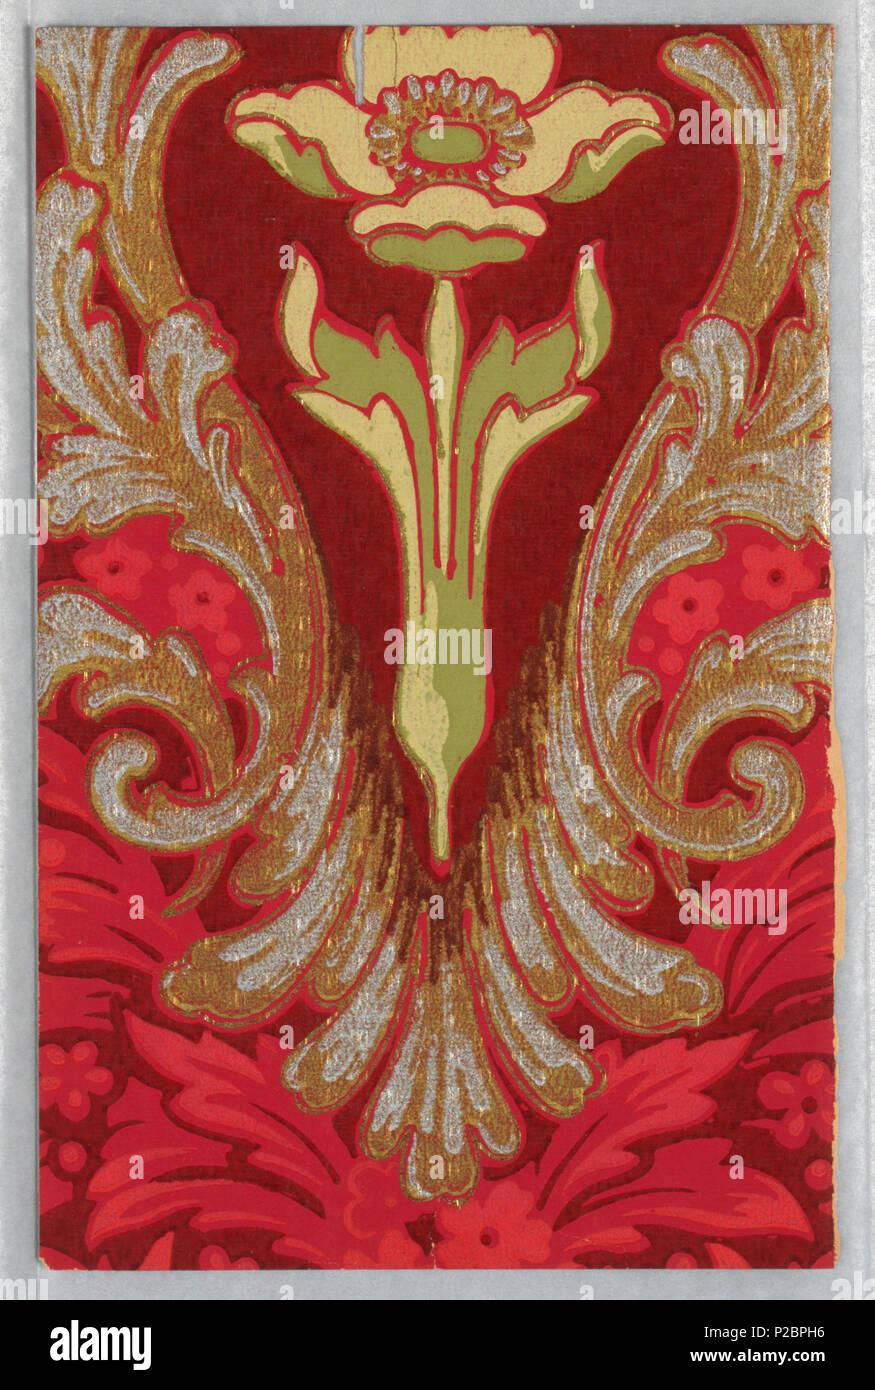 Anglais Flanc Fragment Usa 1905 Anglais Art Nouveau